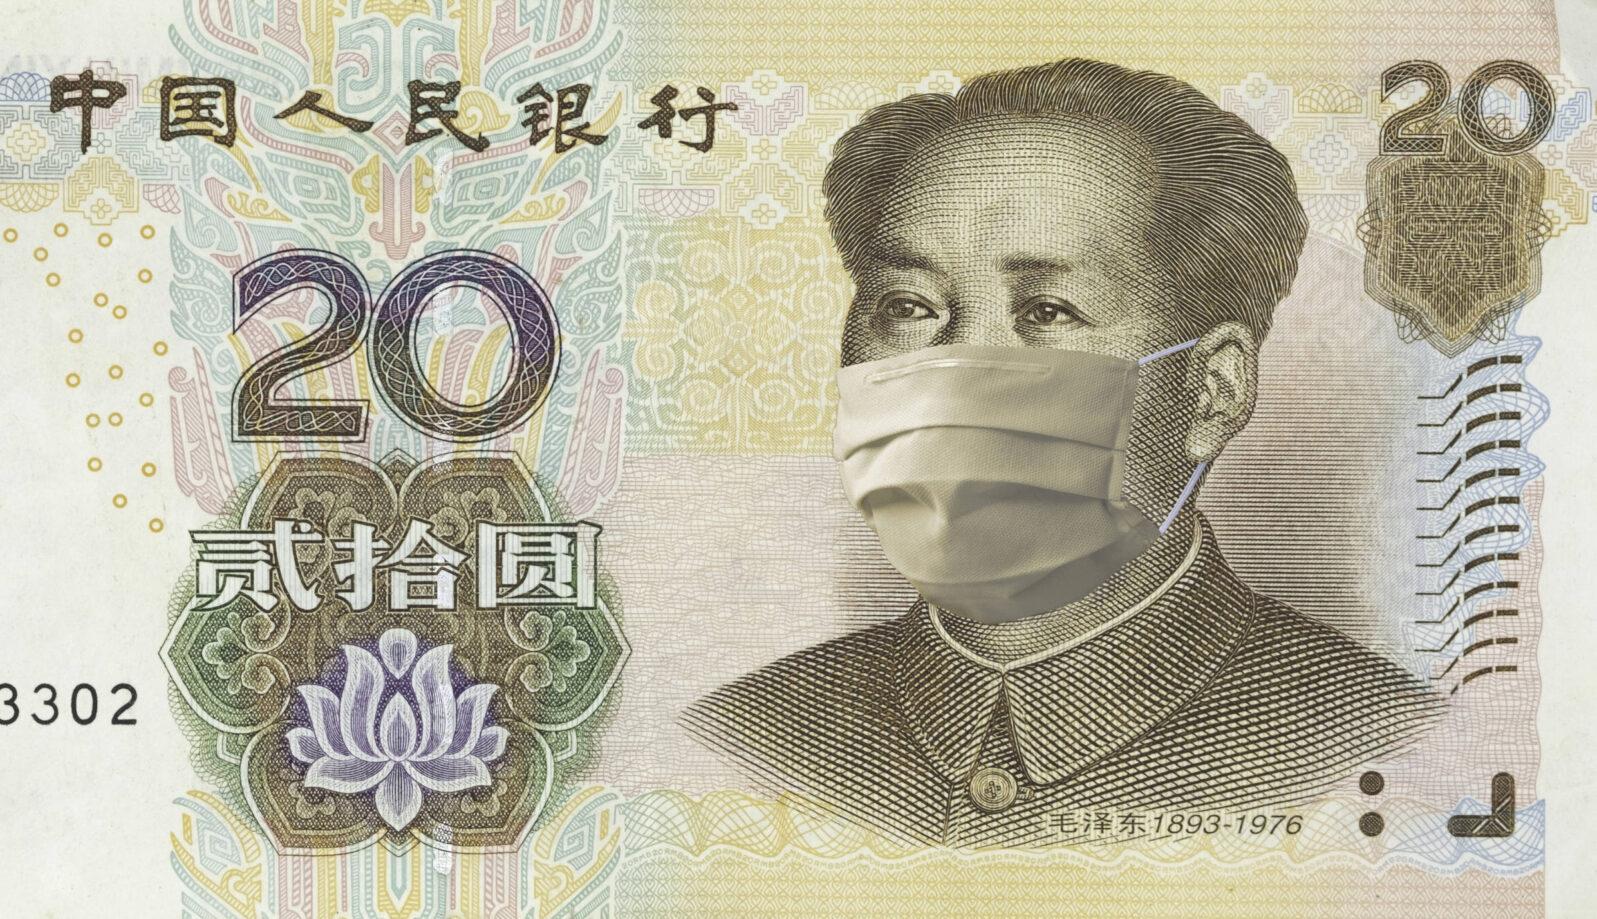 COVID-19 coronavirus in China, renminbi yuan money bill with face mask. COVID global stock market. World economy hit by corona virus outbreak. Financial crisis and coronavirus pandemic concept.